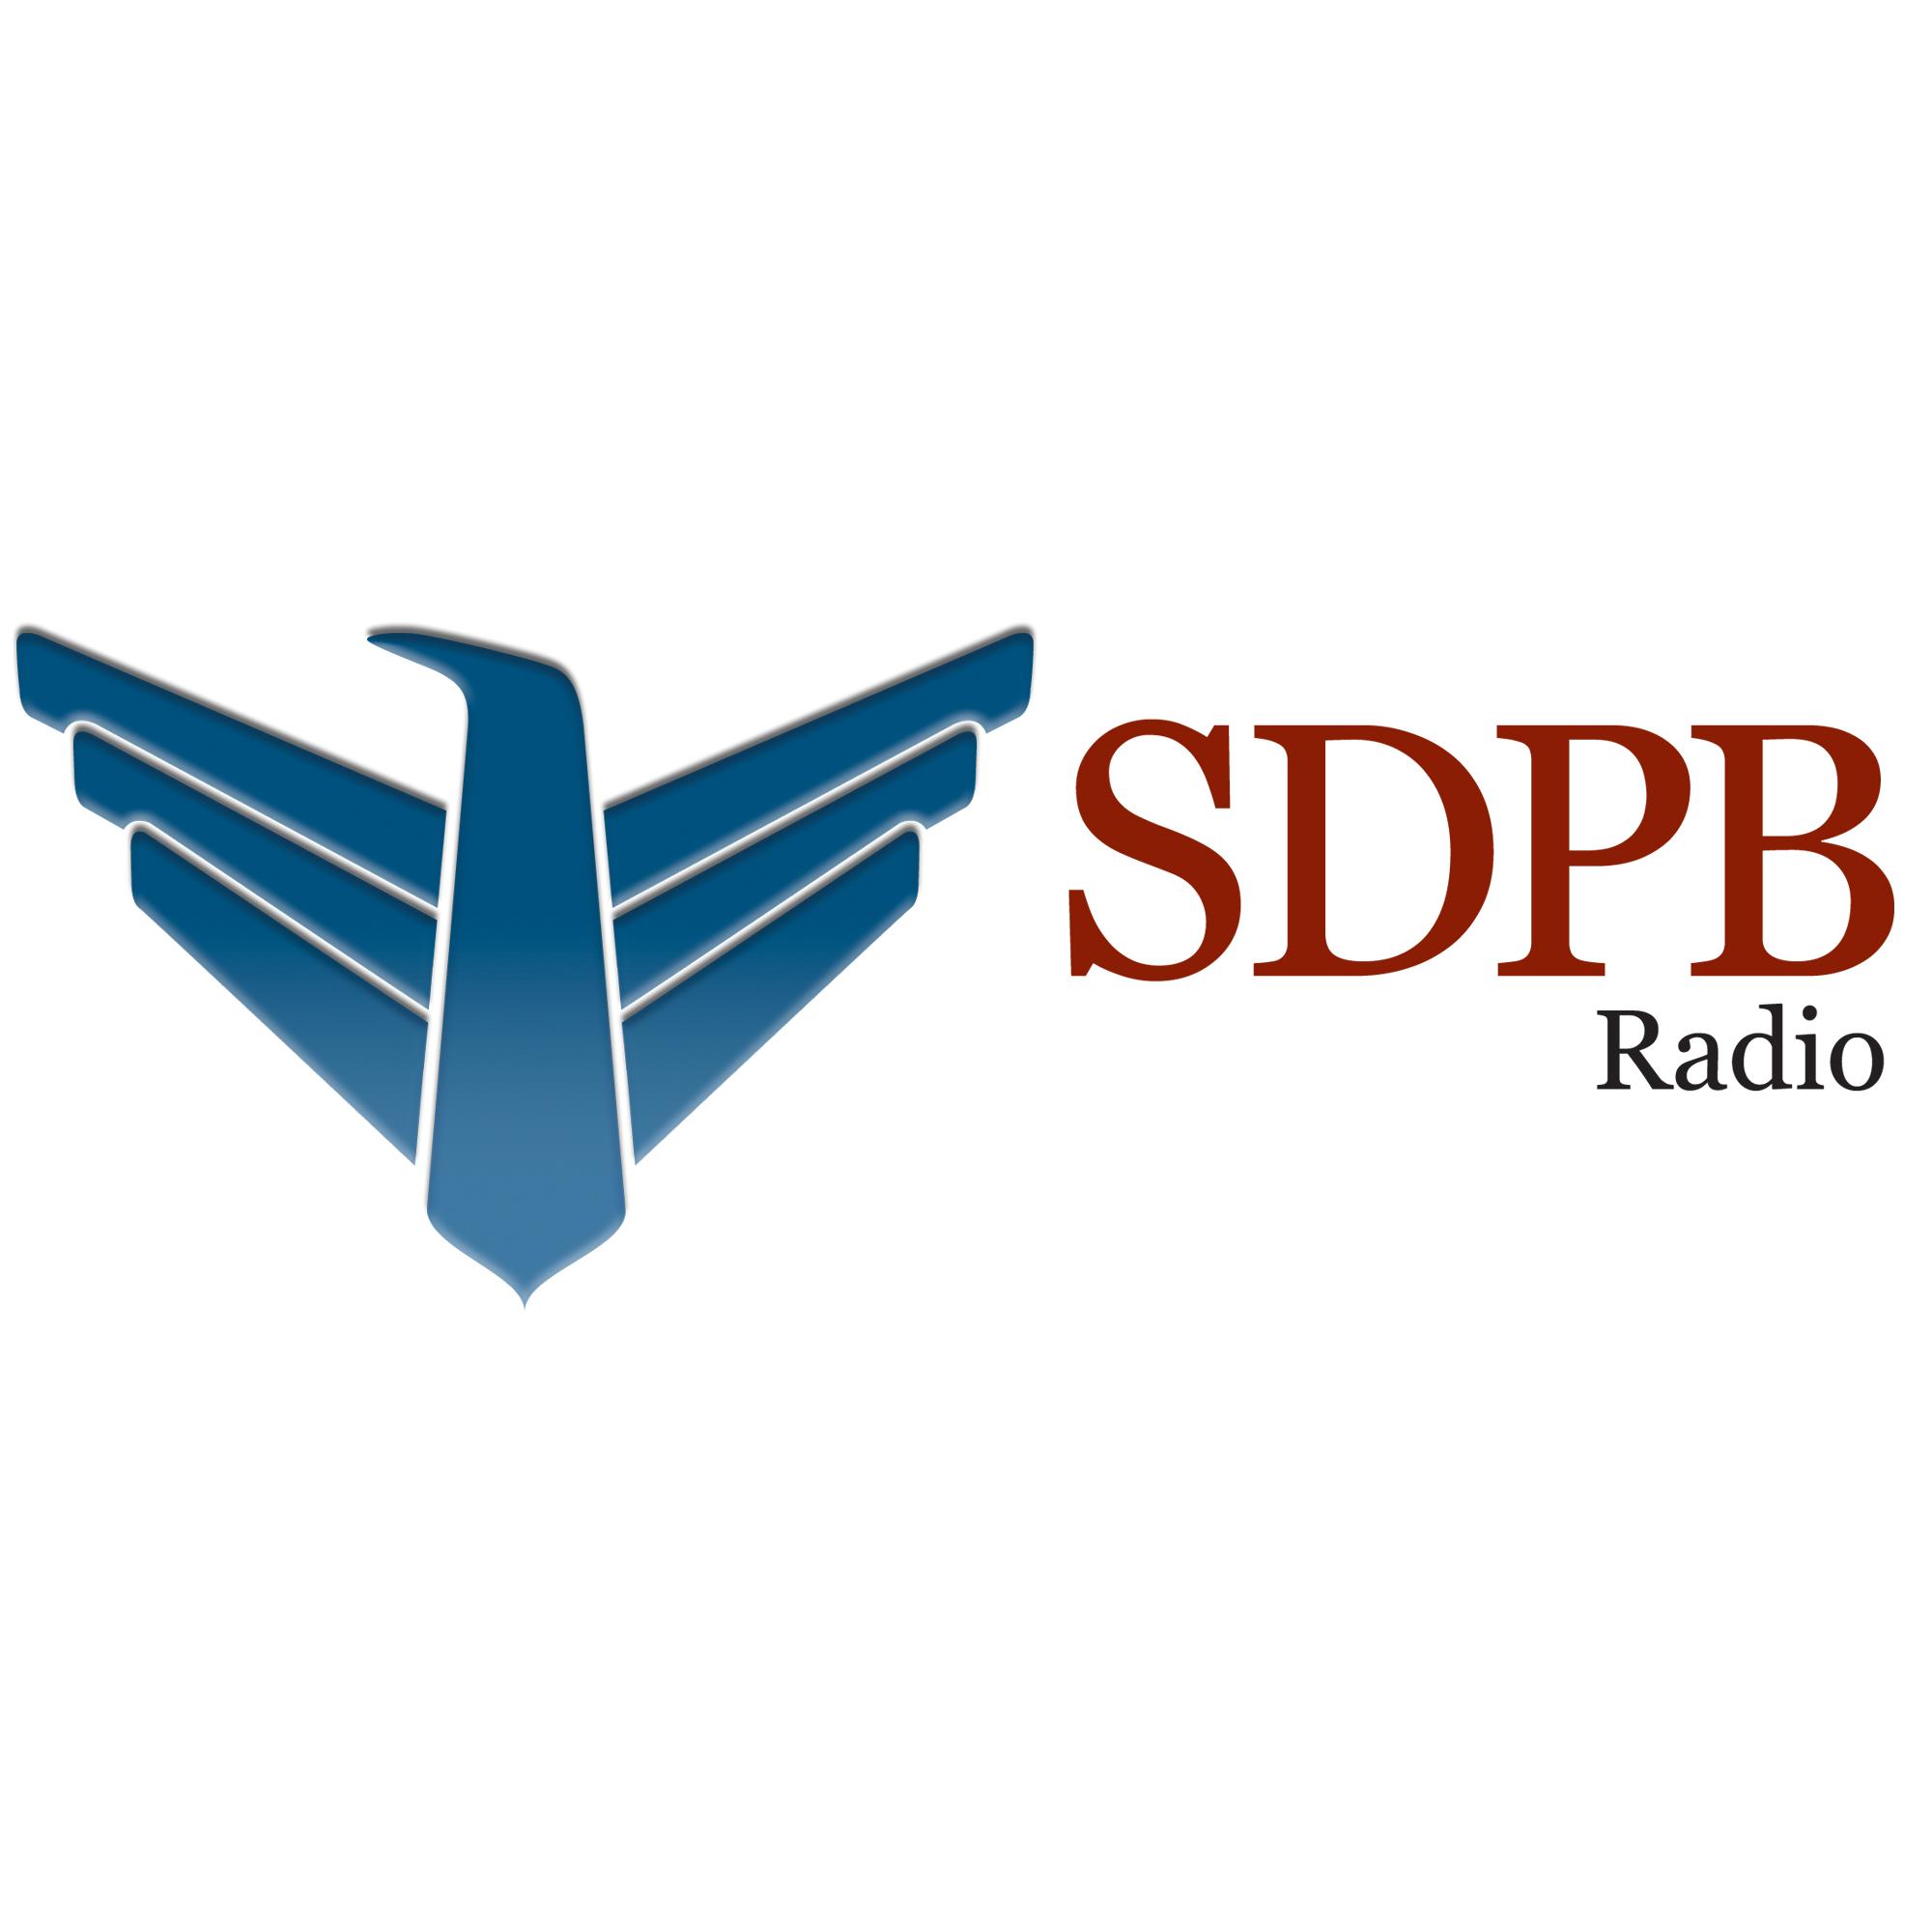 SDPB.jpg